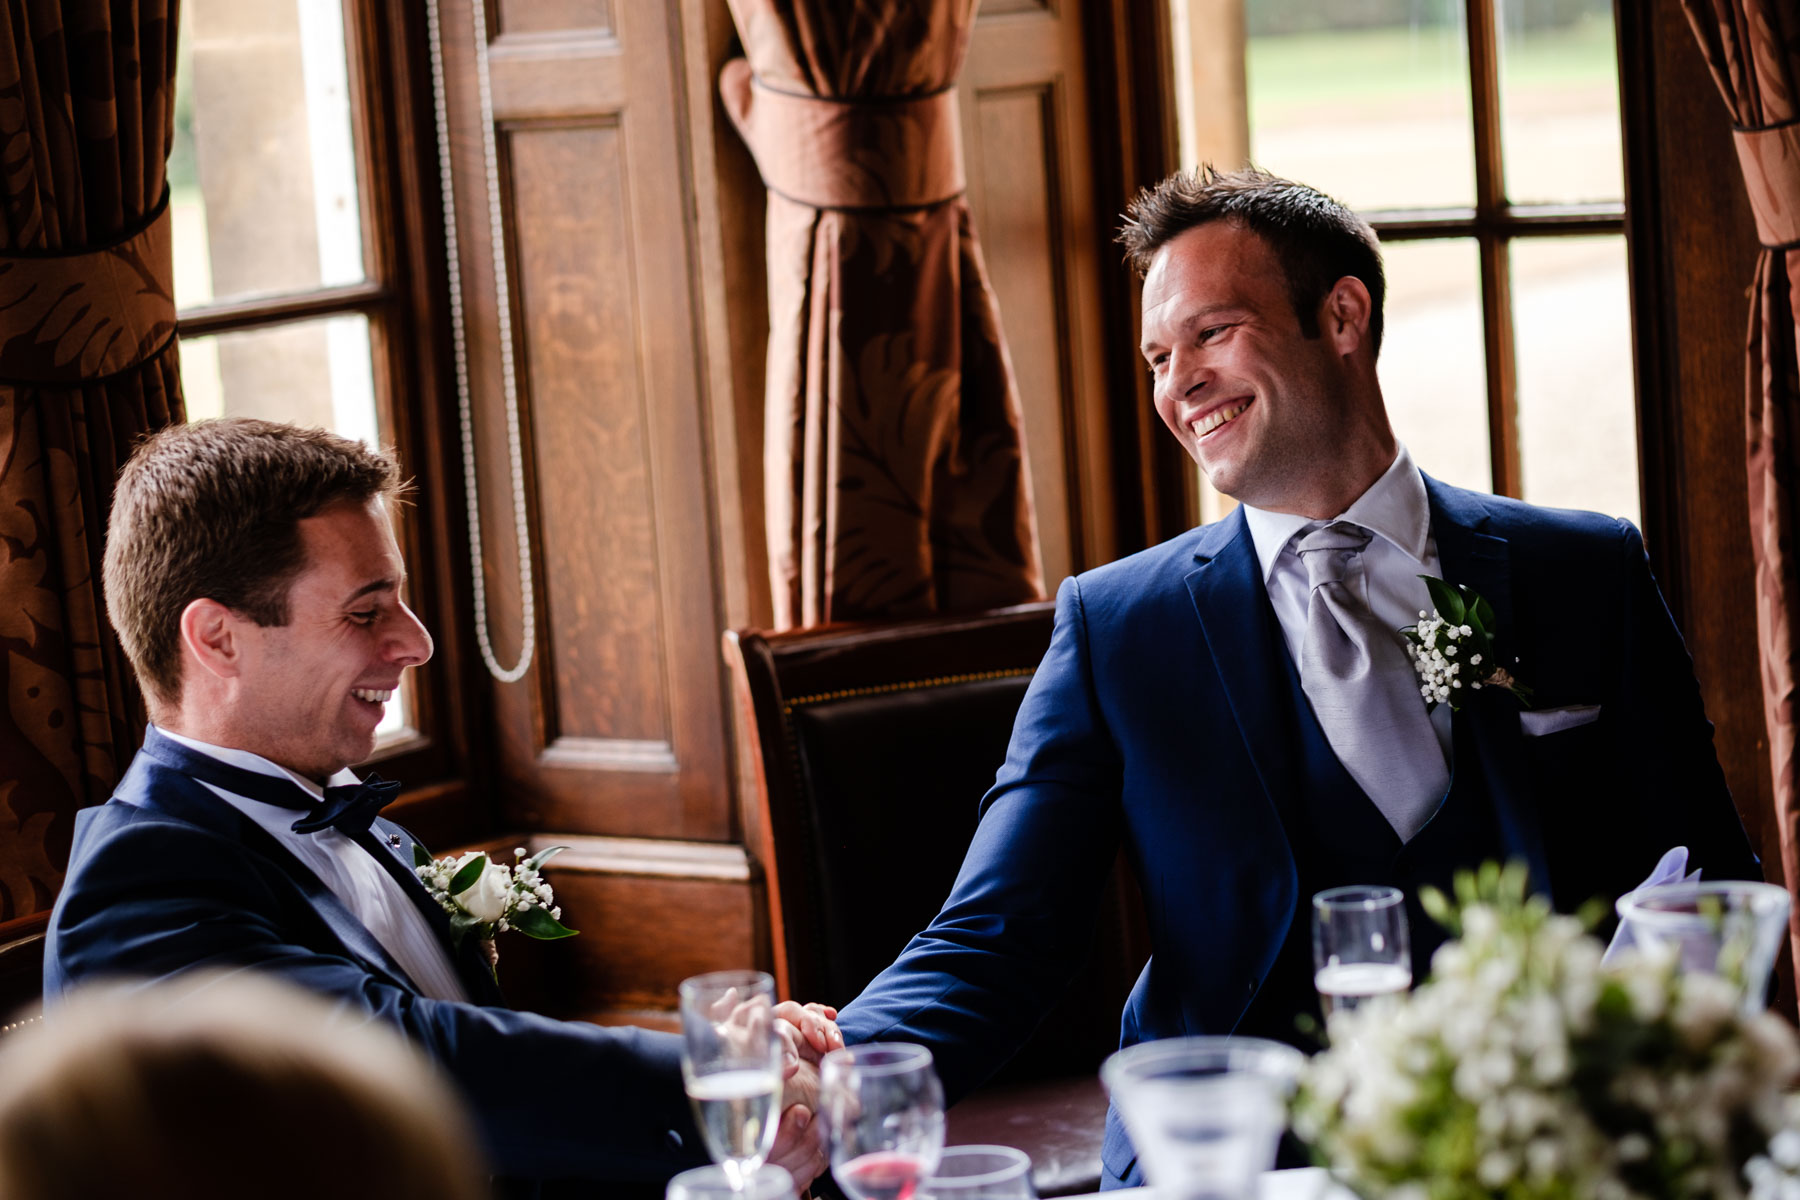 Crathorne Hall Wedding Photography - Jo & Paul (287).jpg